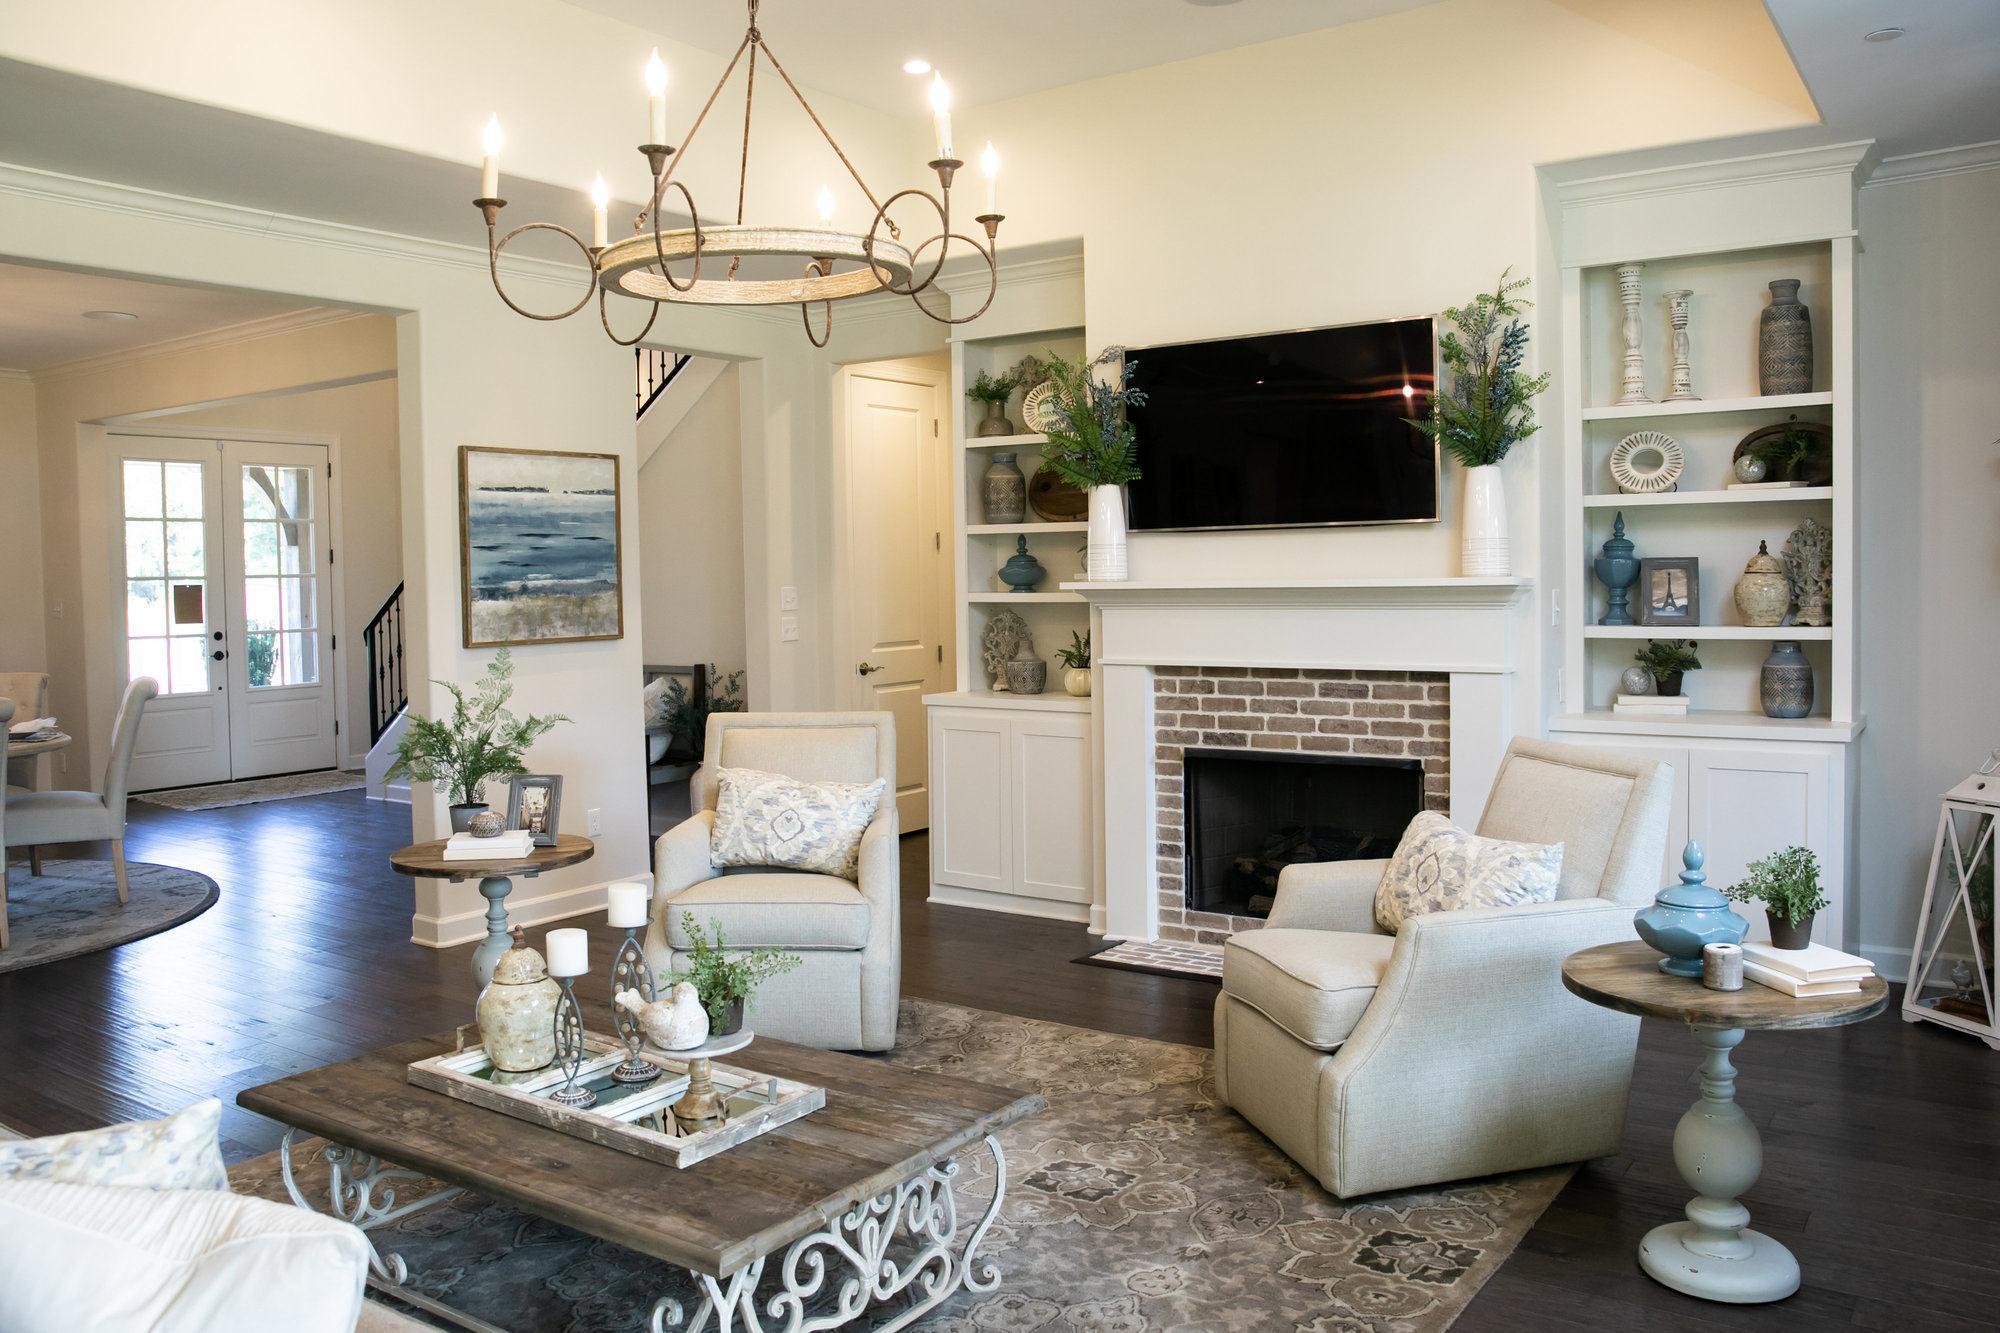 Living Area featured in the Stonebridge By Regency Homebuilders in Memphis, TN